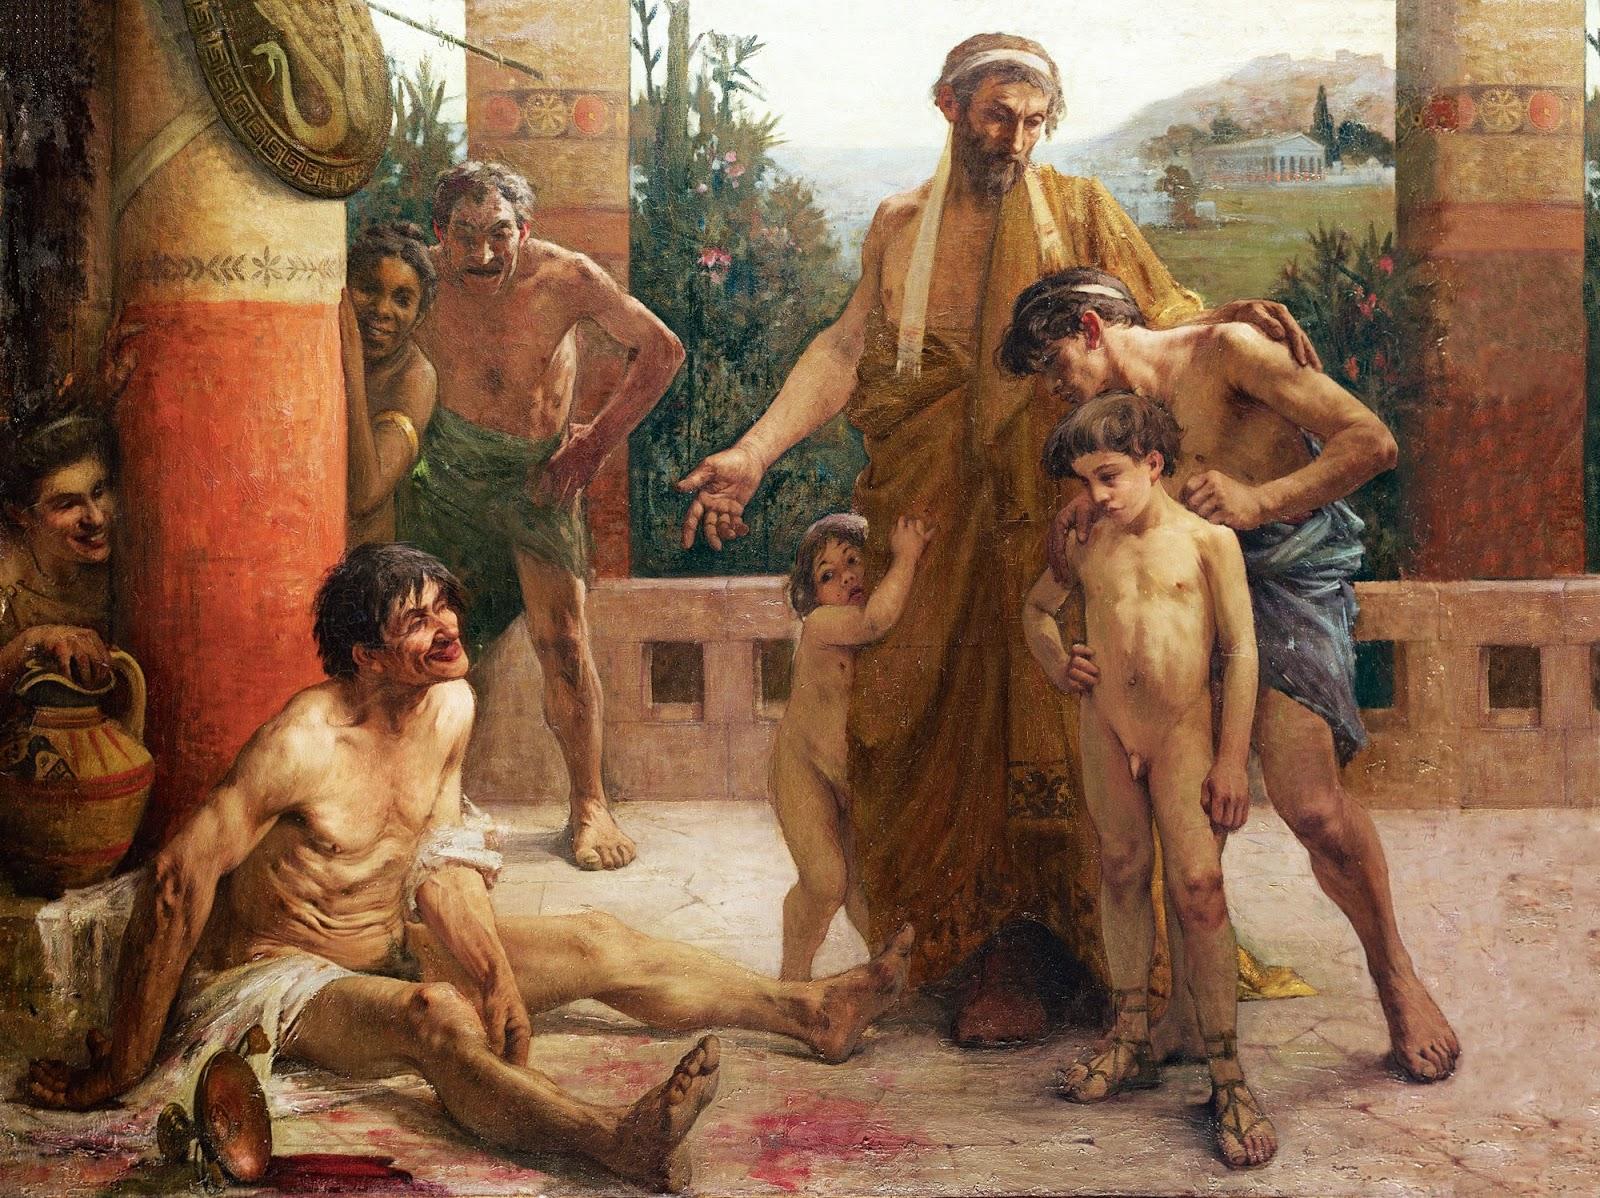 esclavitud en la antigua grecia, esparta